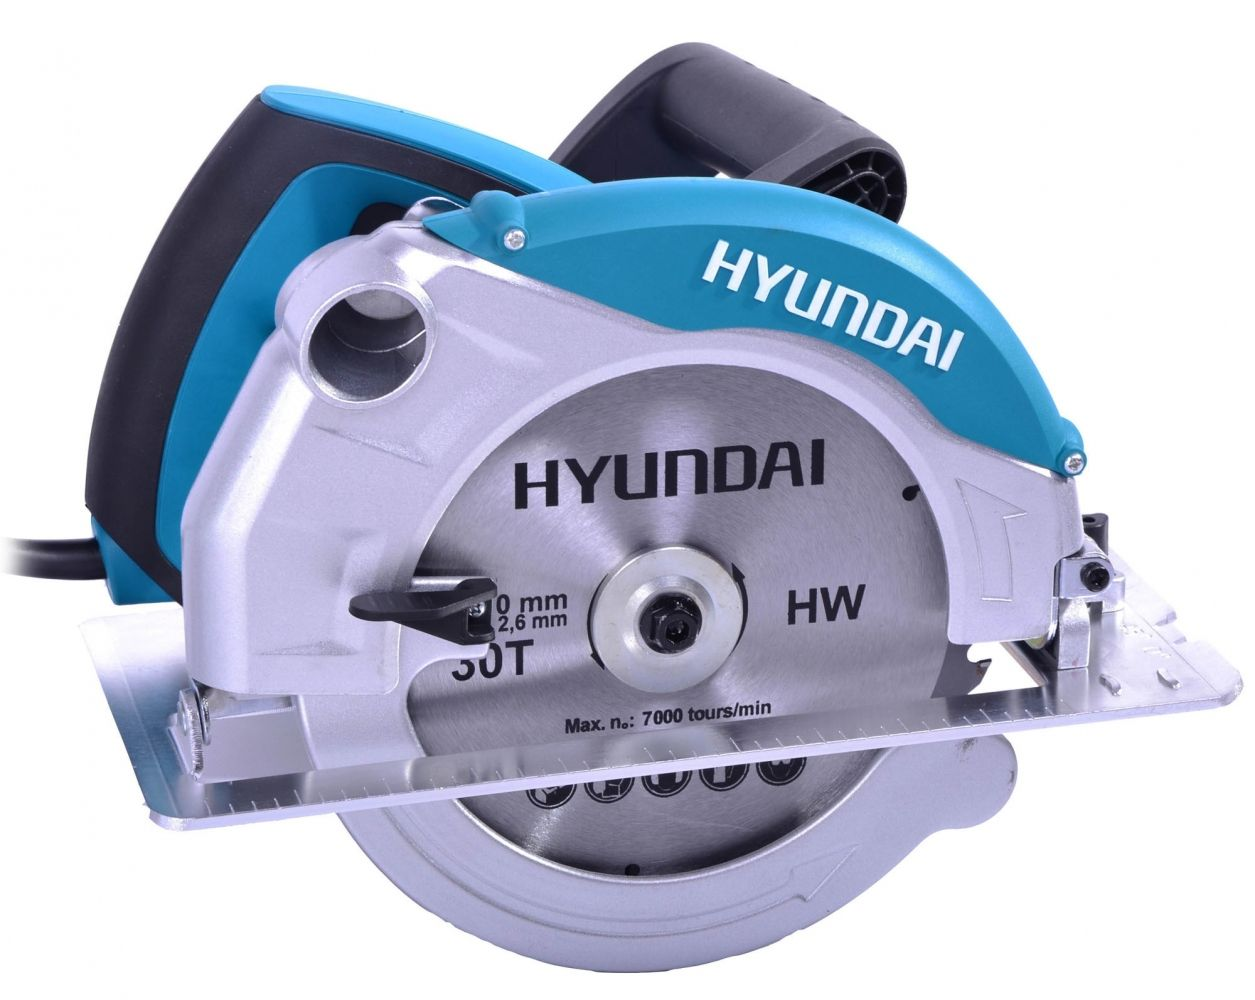 Купить Циркулярные пилы, Пила циркулярная Hyundai C 1800-210